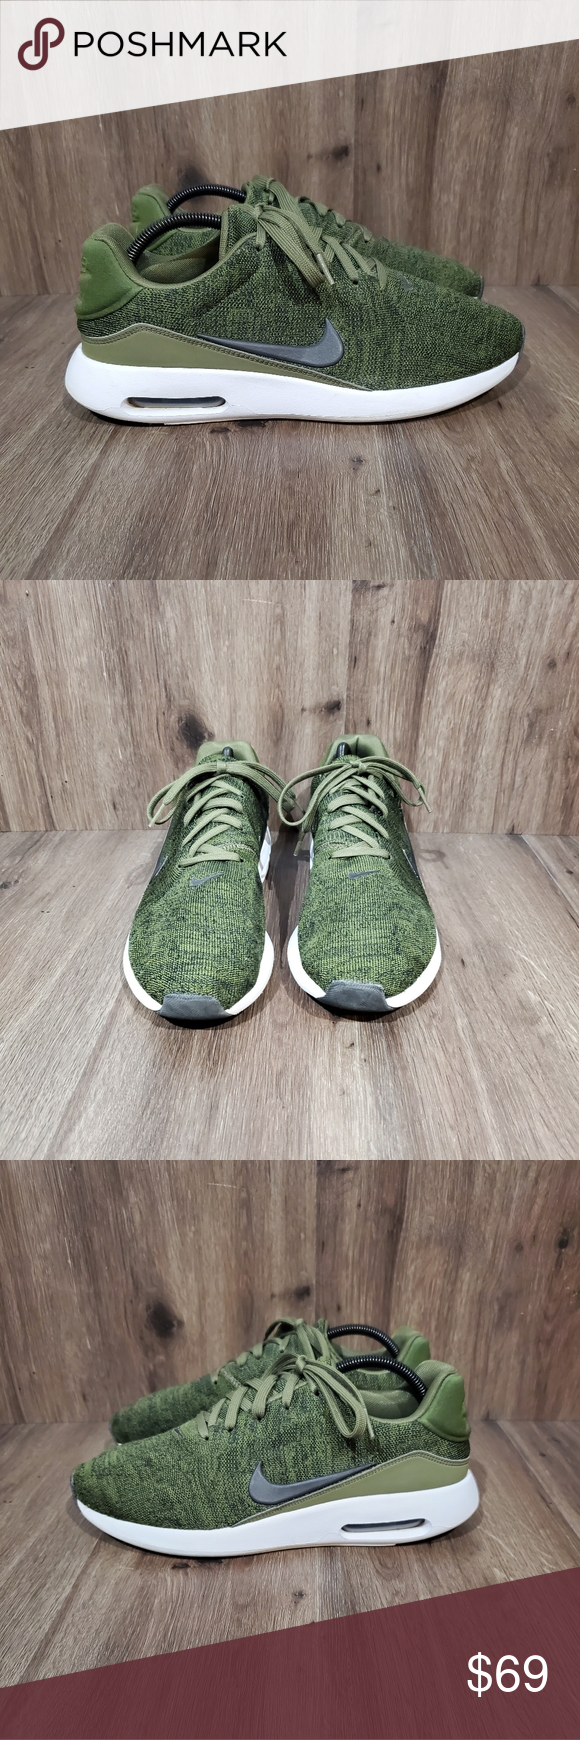 Intensive Ant nothing  Nike Air Max Modern Flyknit Sneakers olive green | Nike air max modern,  Flyknit, Nike air max